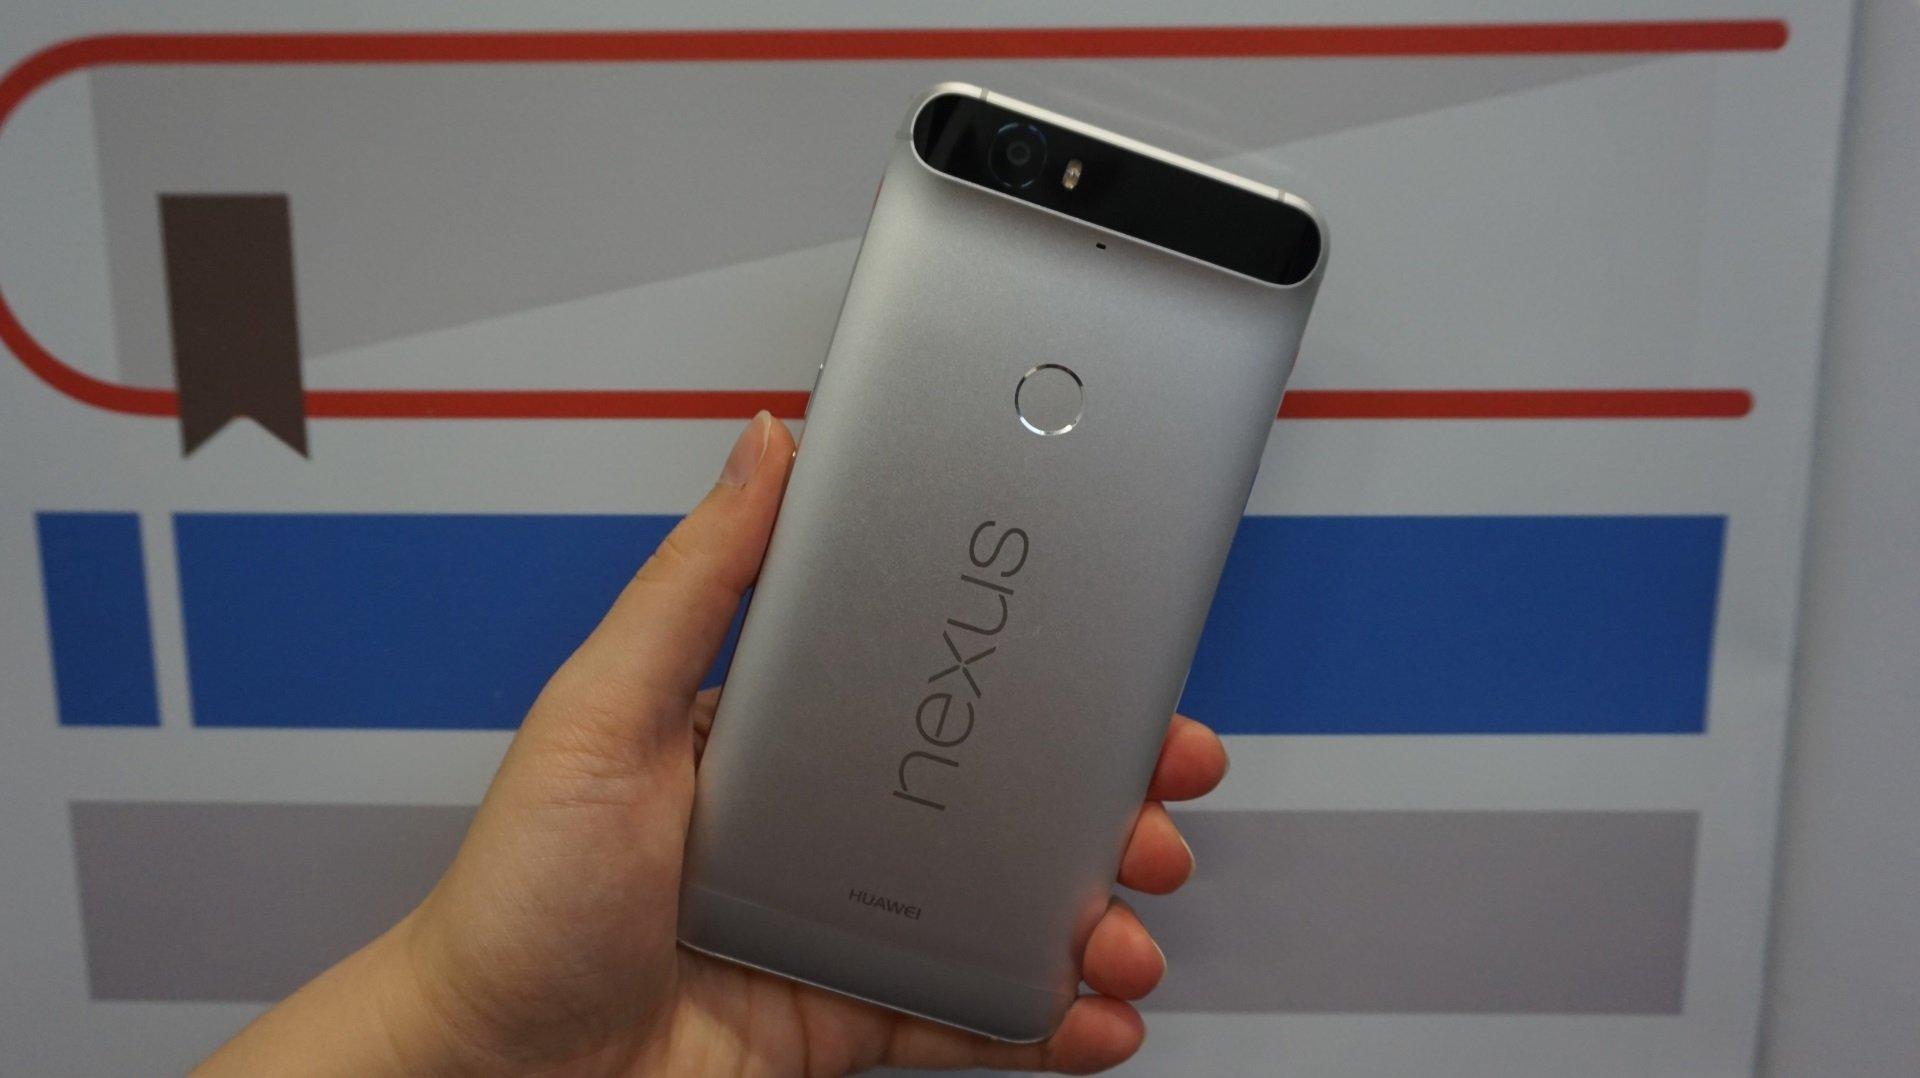 Google Nexus 6P review: Time to let go | Expert Reviews